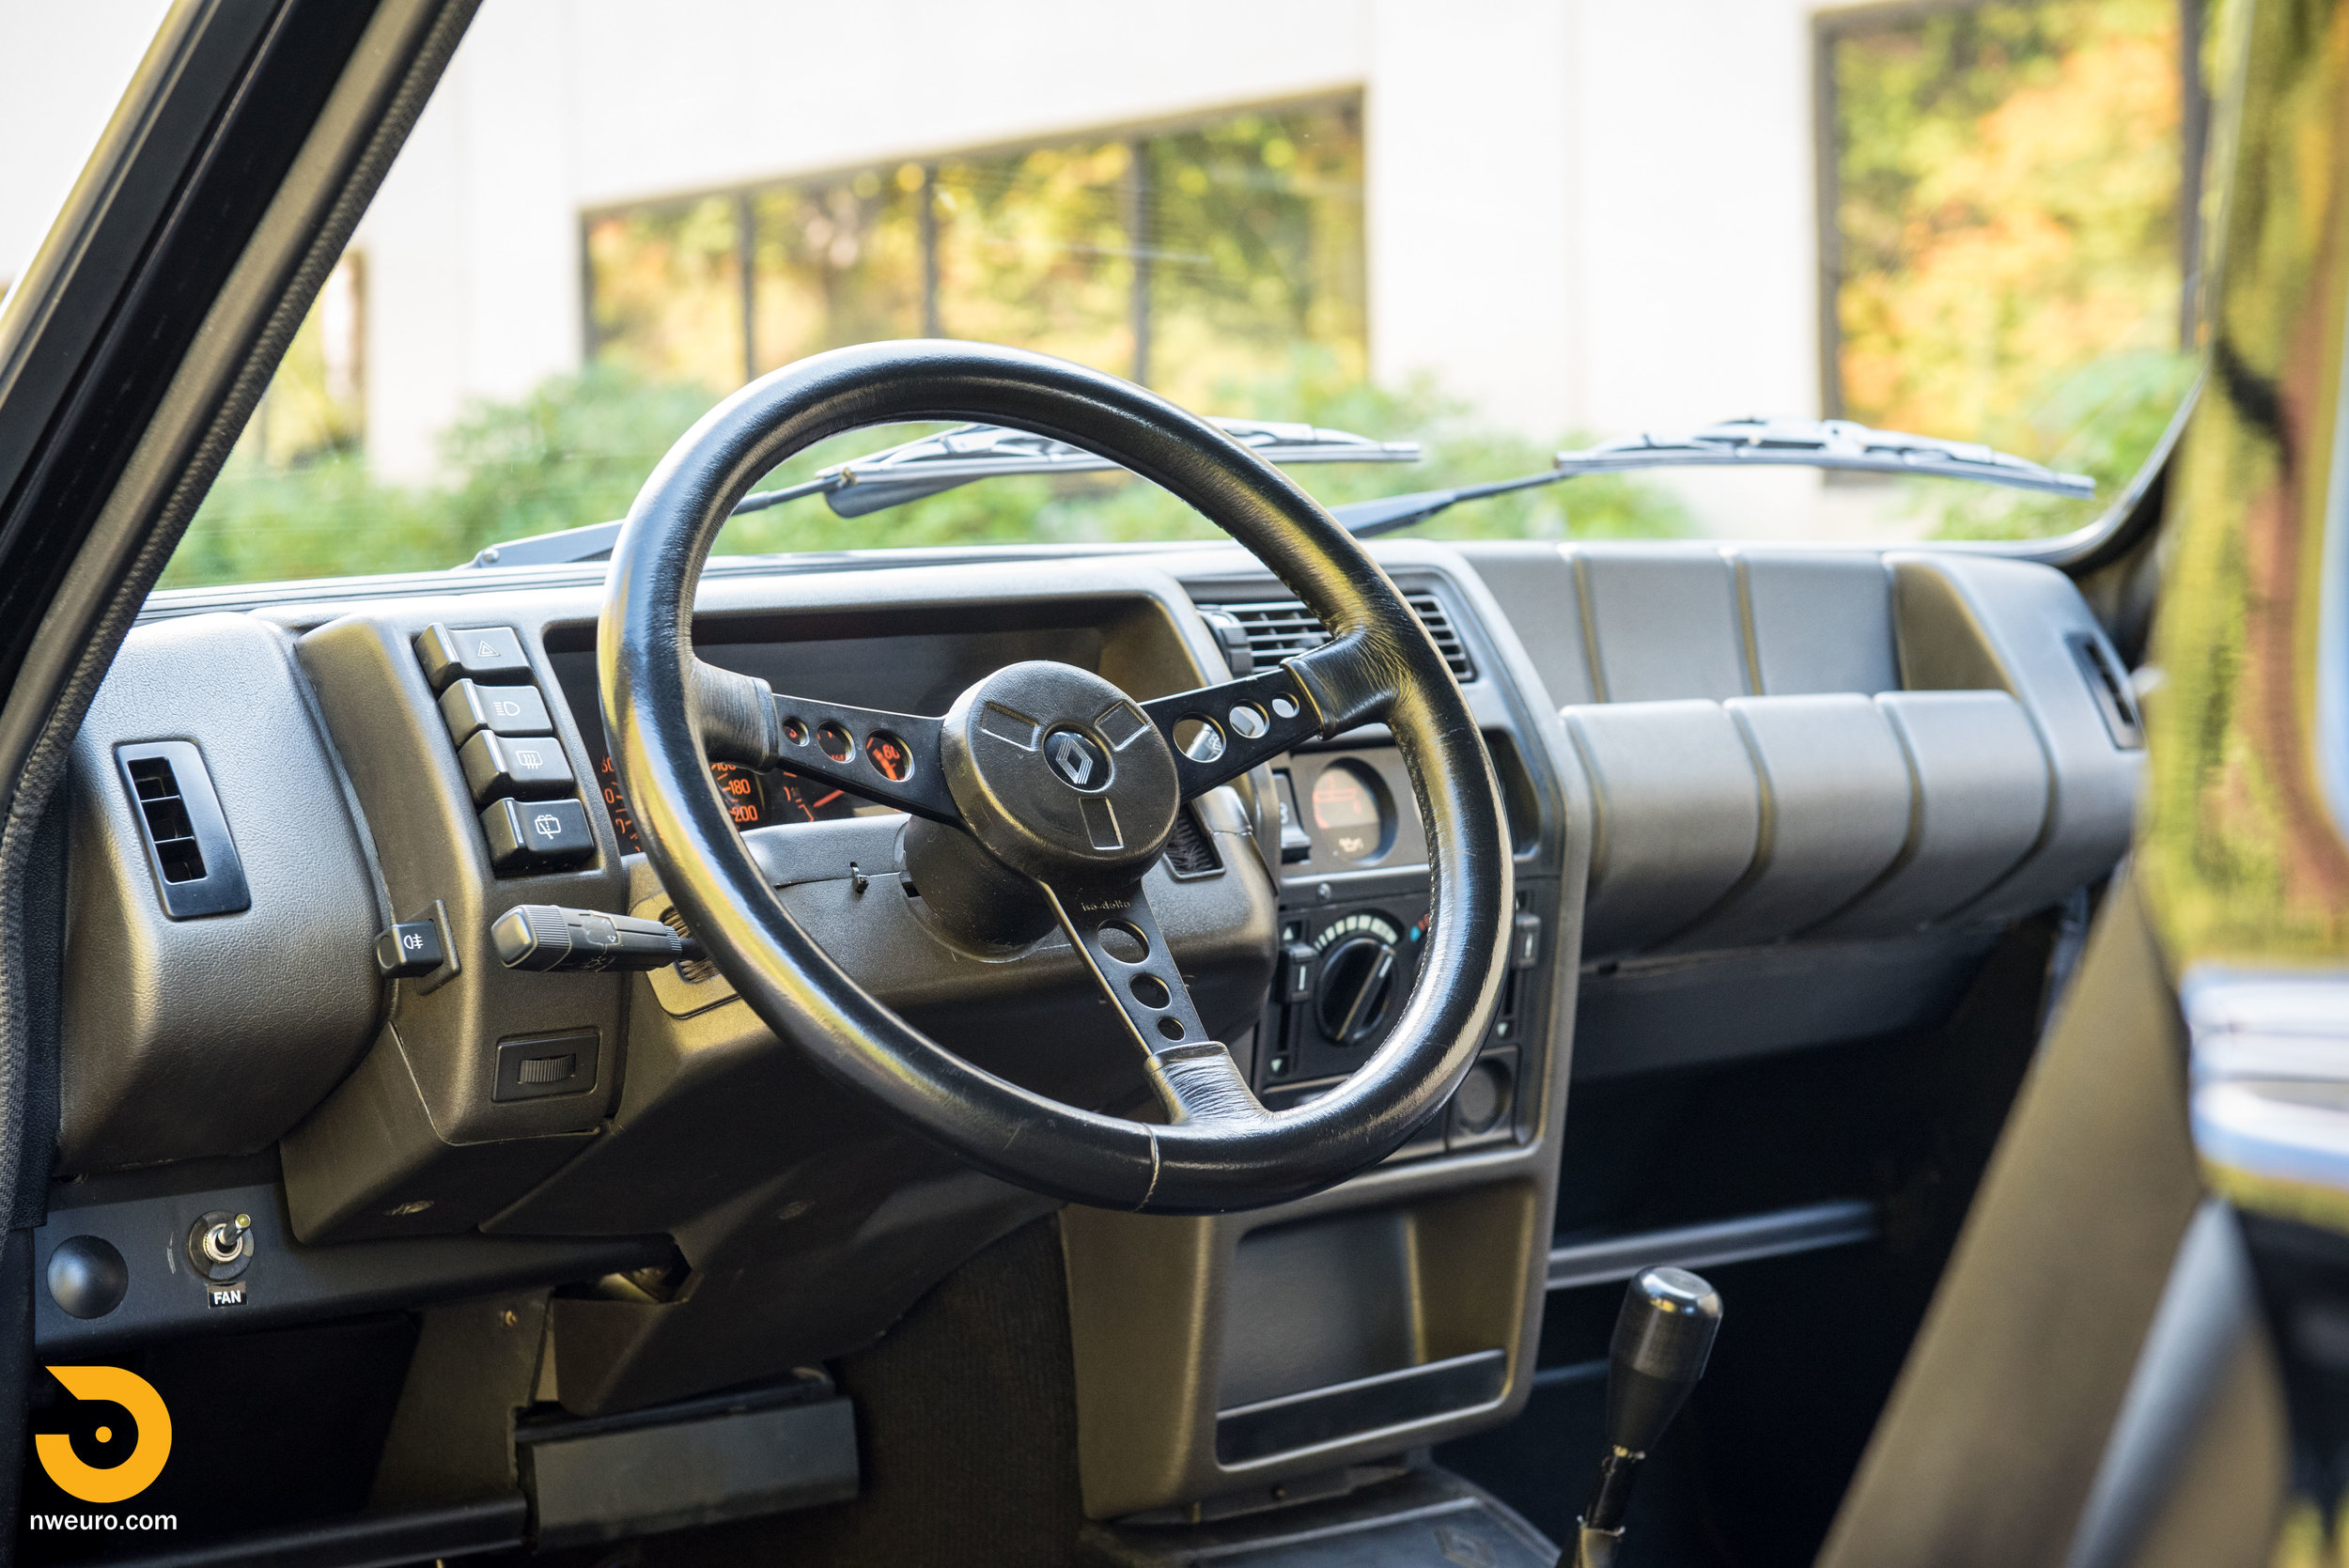 1983 Renault R5 Turbo 2 Black-7.jpg